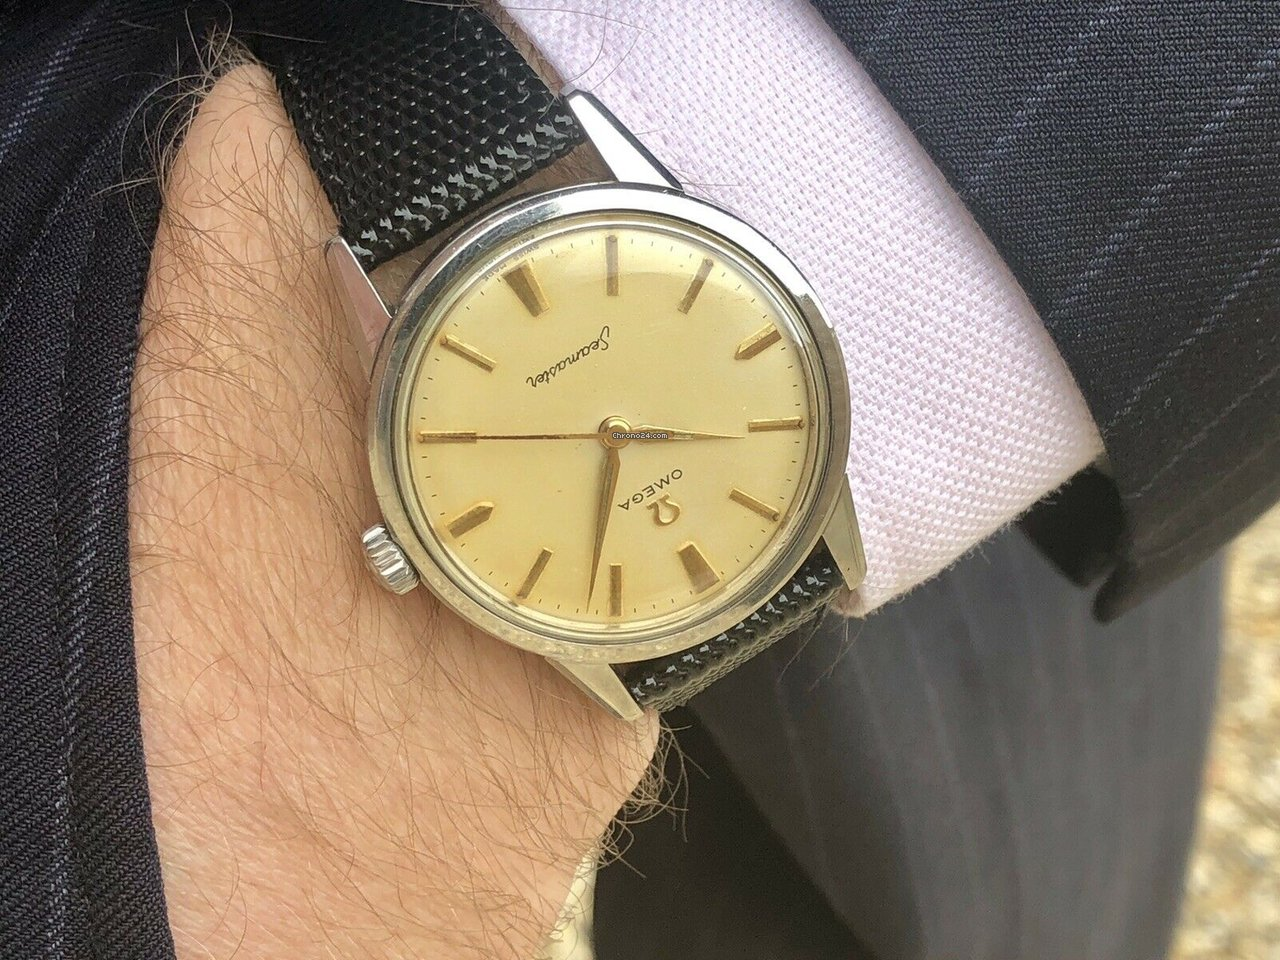 f90652e2e02 Comprar relógios vintage baratos na Chrono24